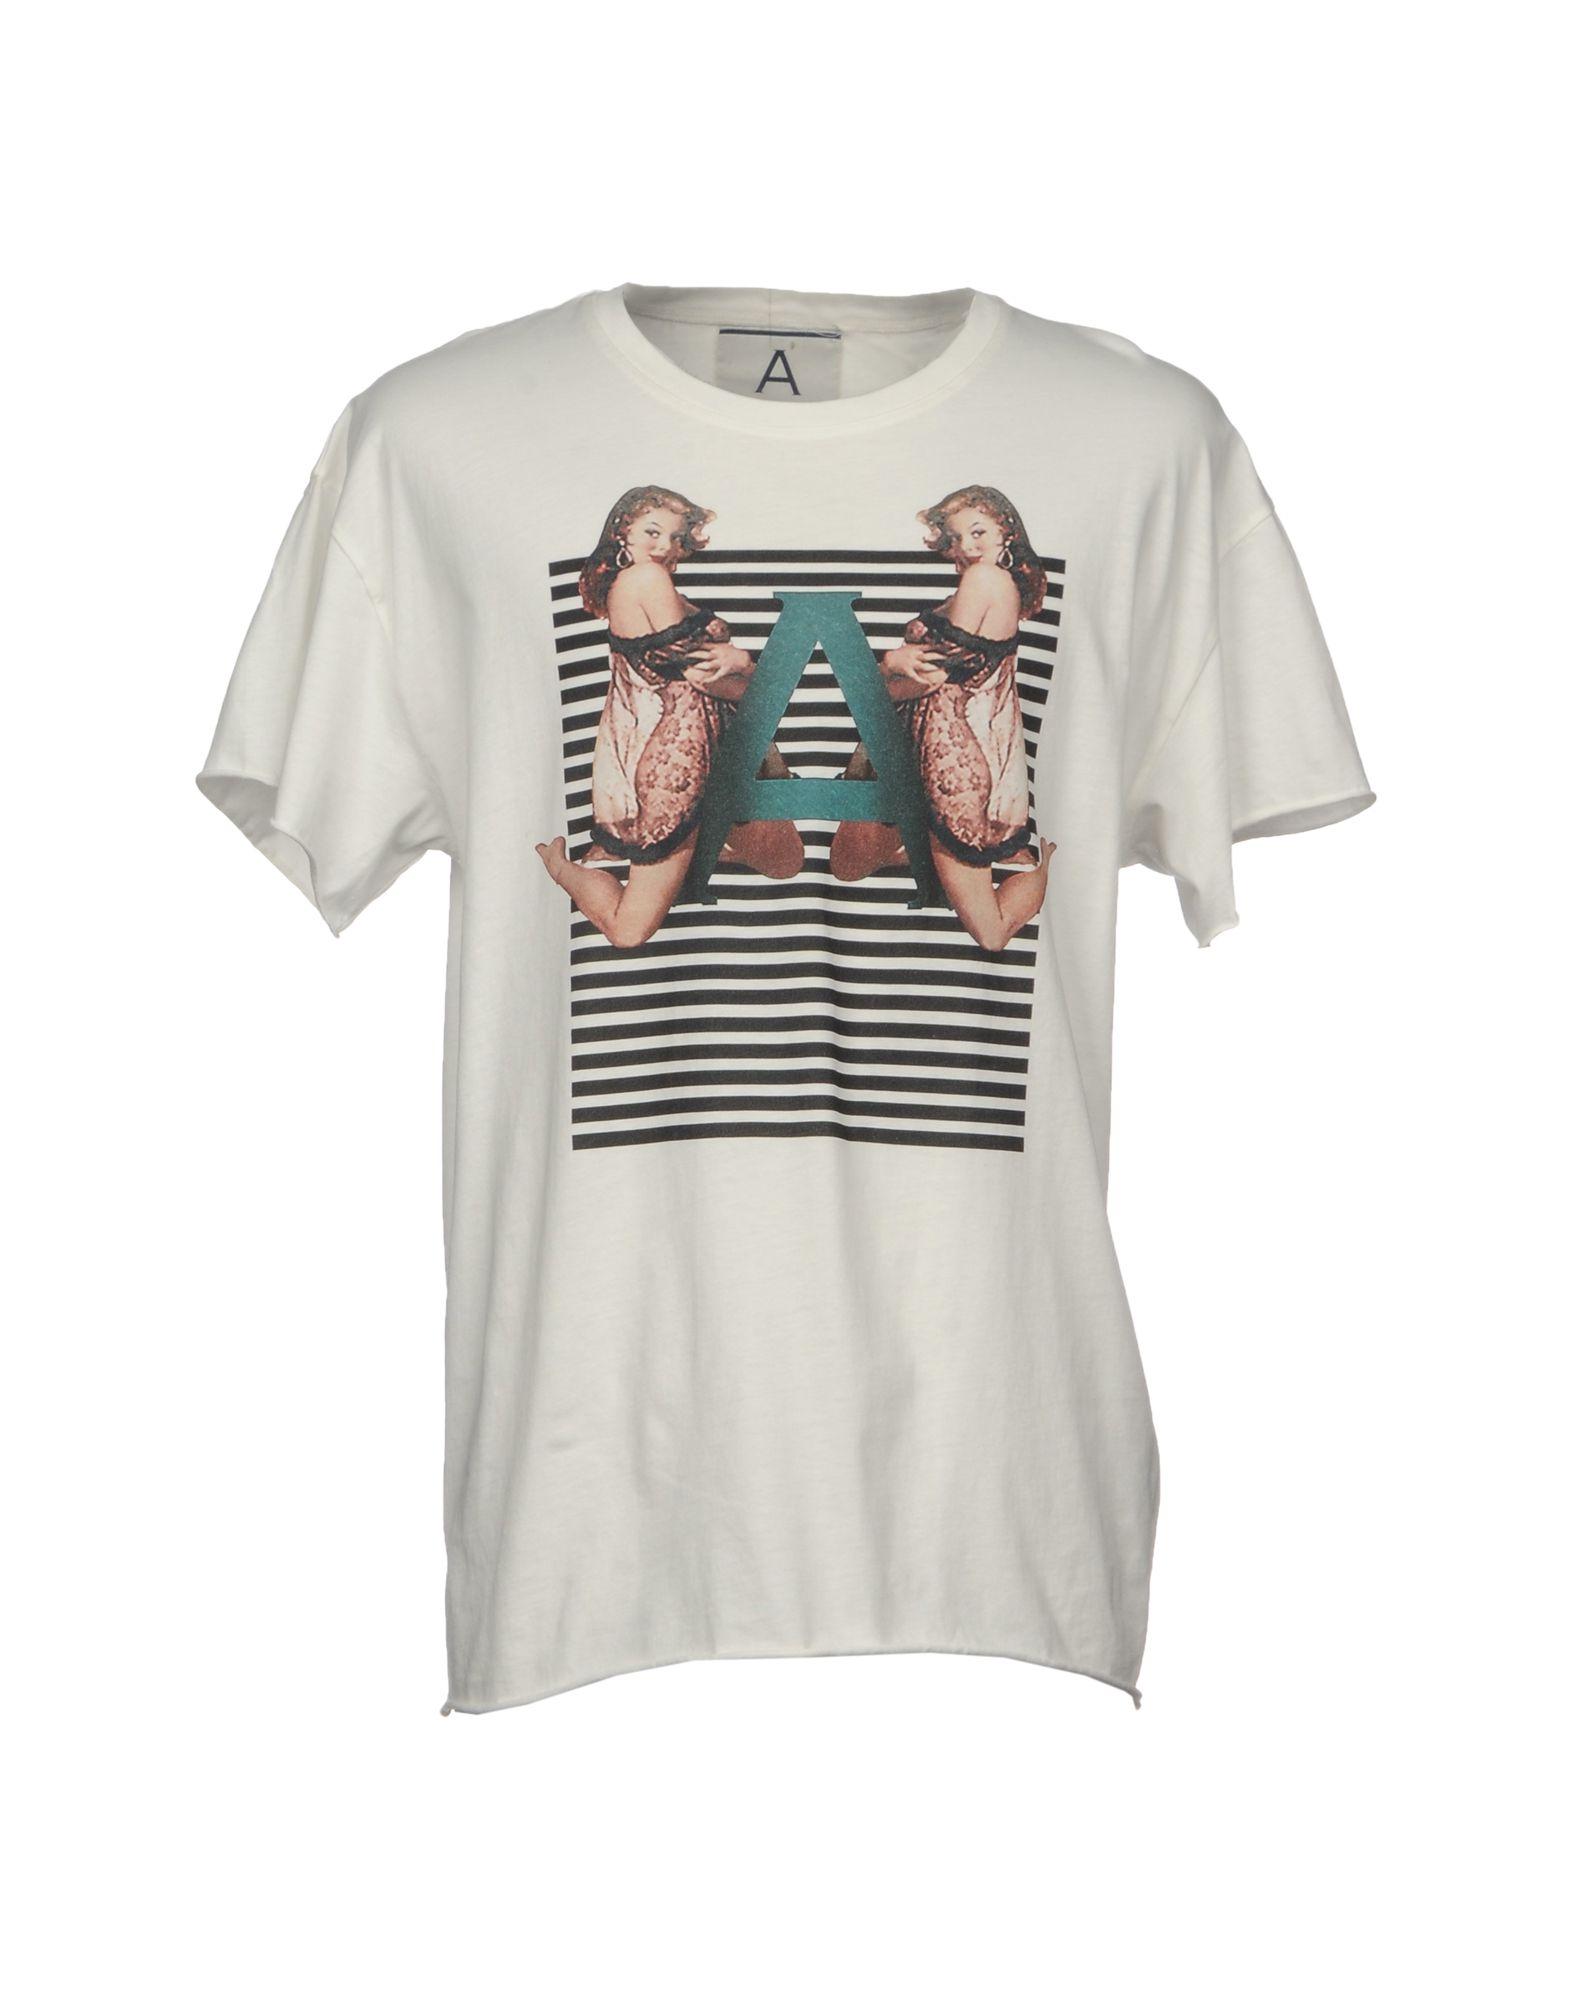 T-Shirt Andrea Pompilio Pompilio Andrea Uomo - 12089546GW b42433